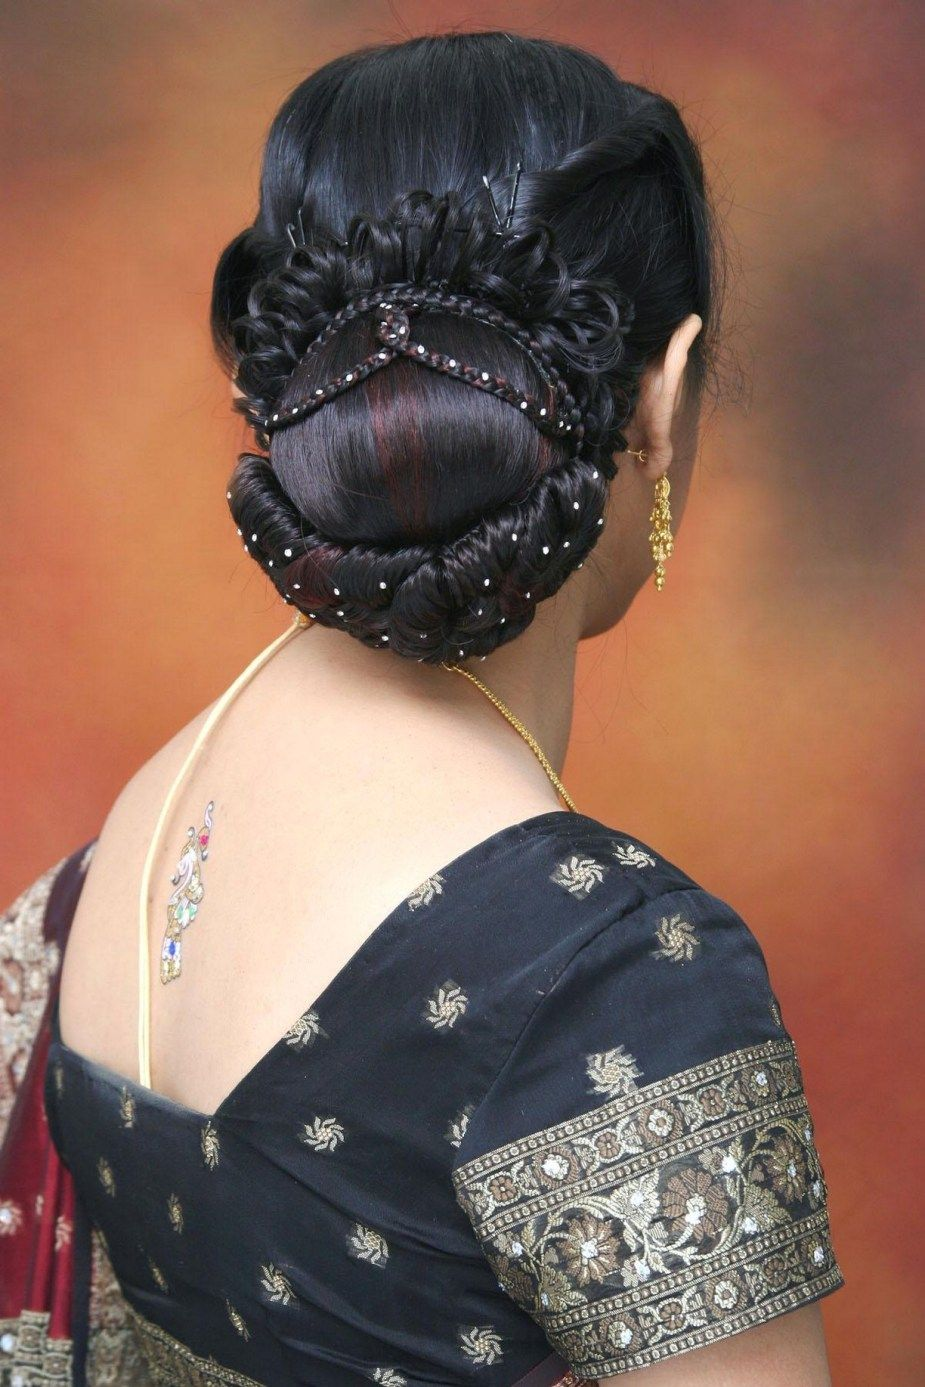 kerala christian wedding hair style for girls | wedding